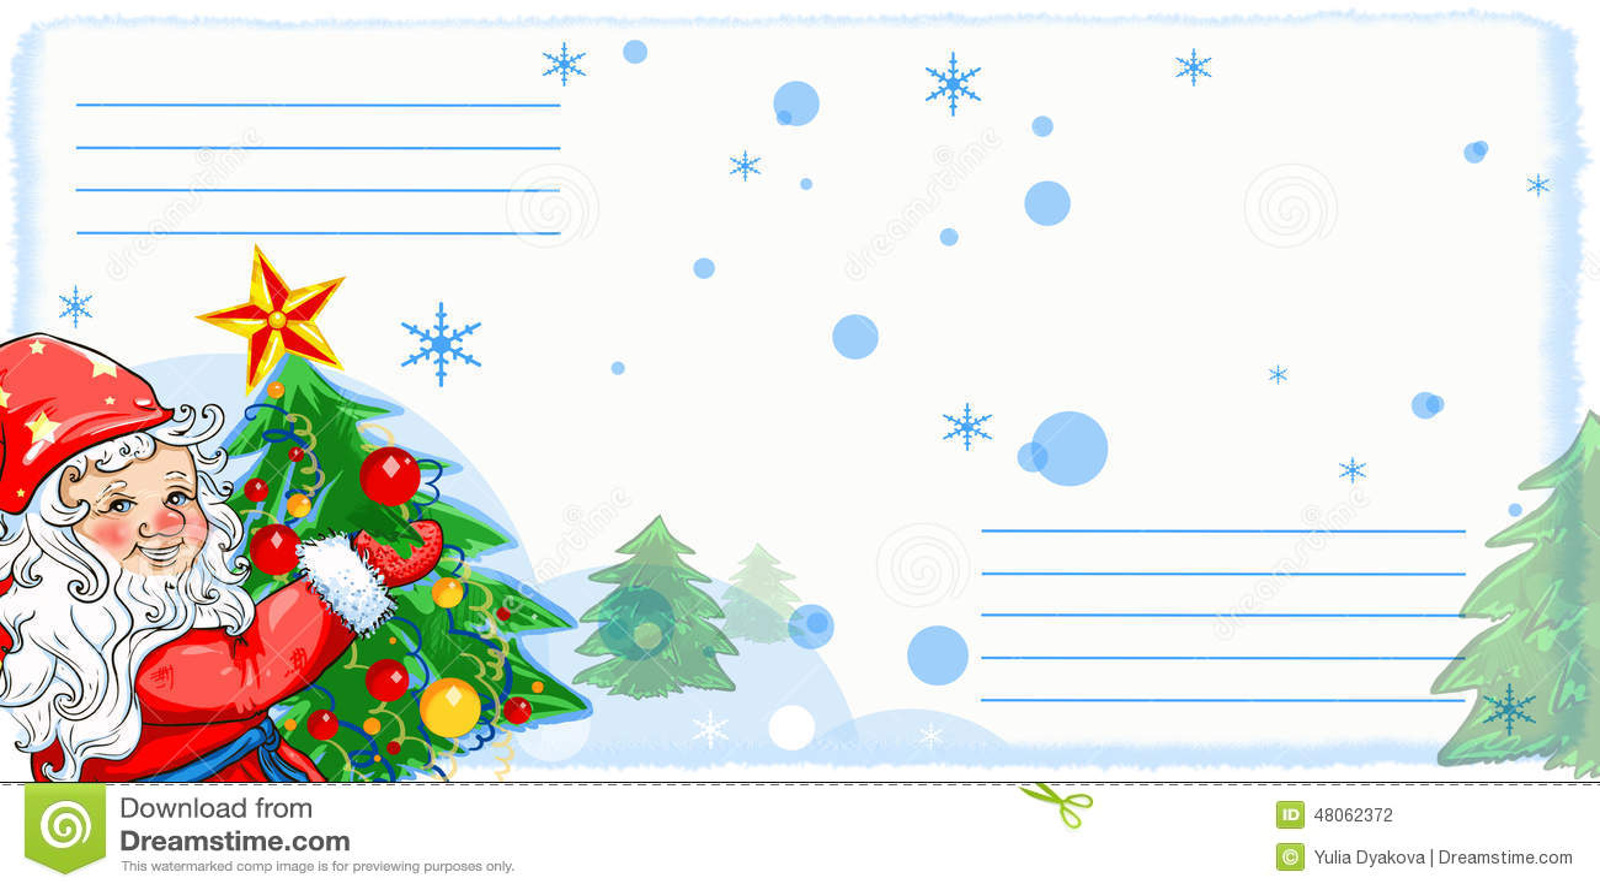 Air Mail Envelope, Illustration Stock Illustration - Illustration of ...